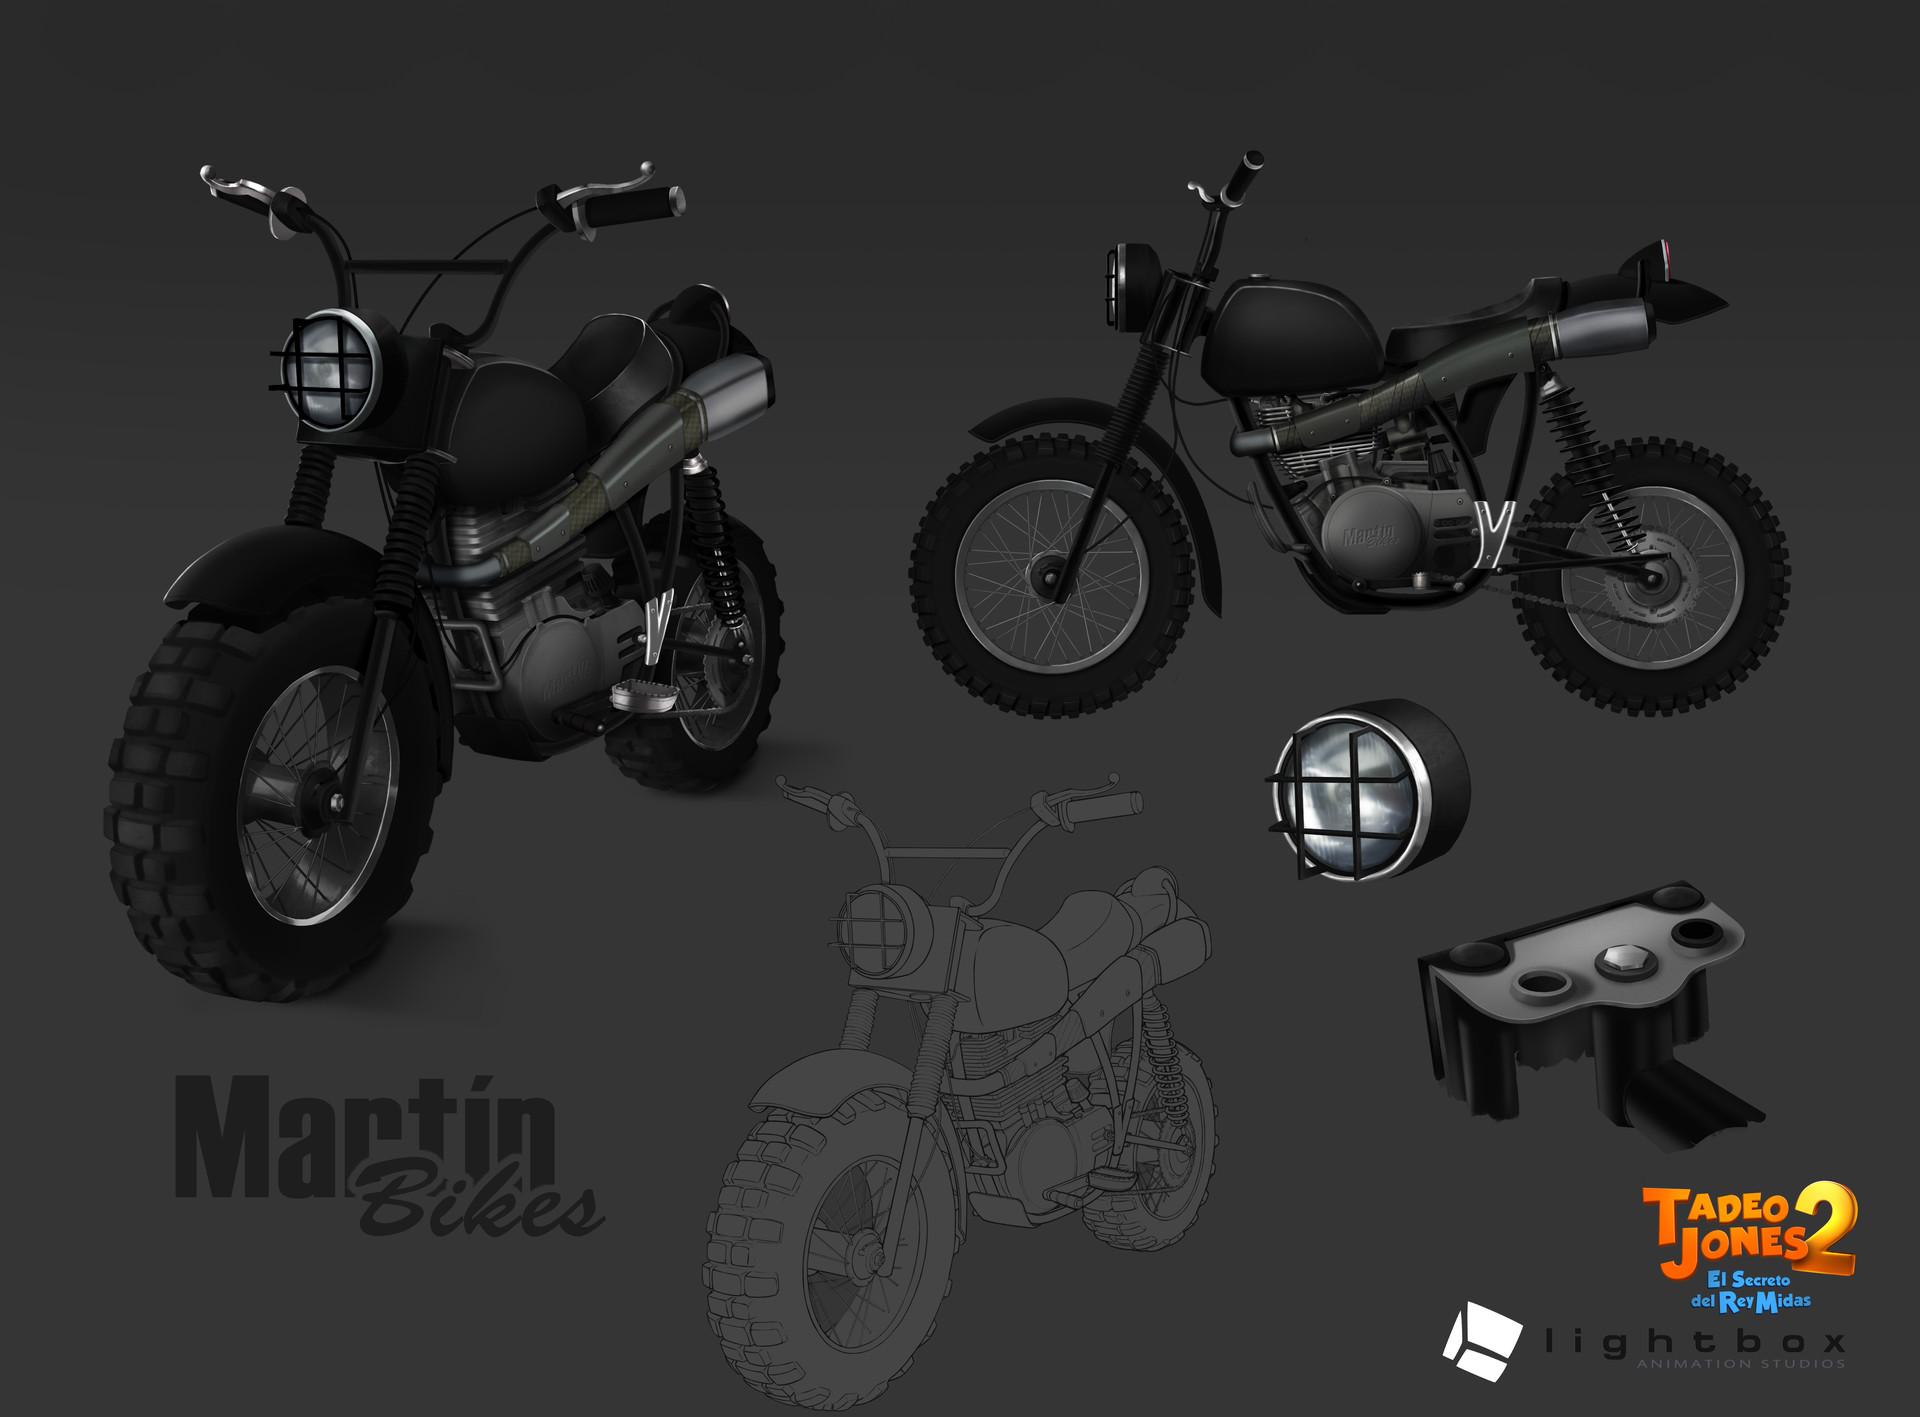 Angel oromendia motorcycle